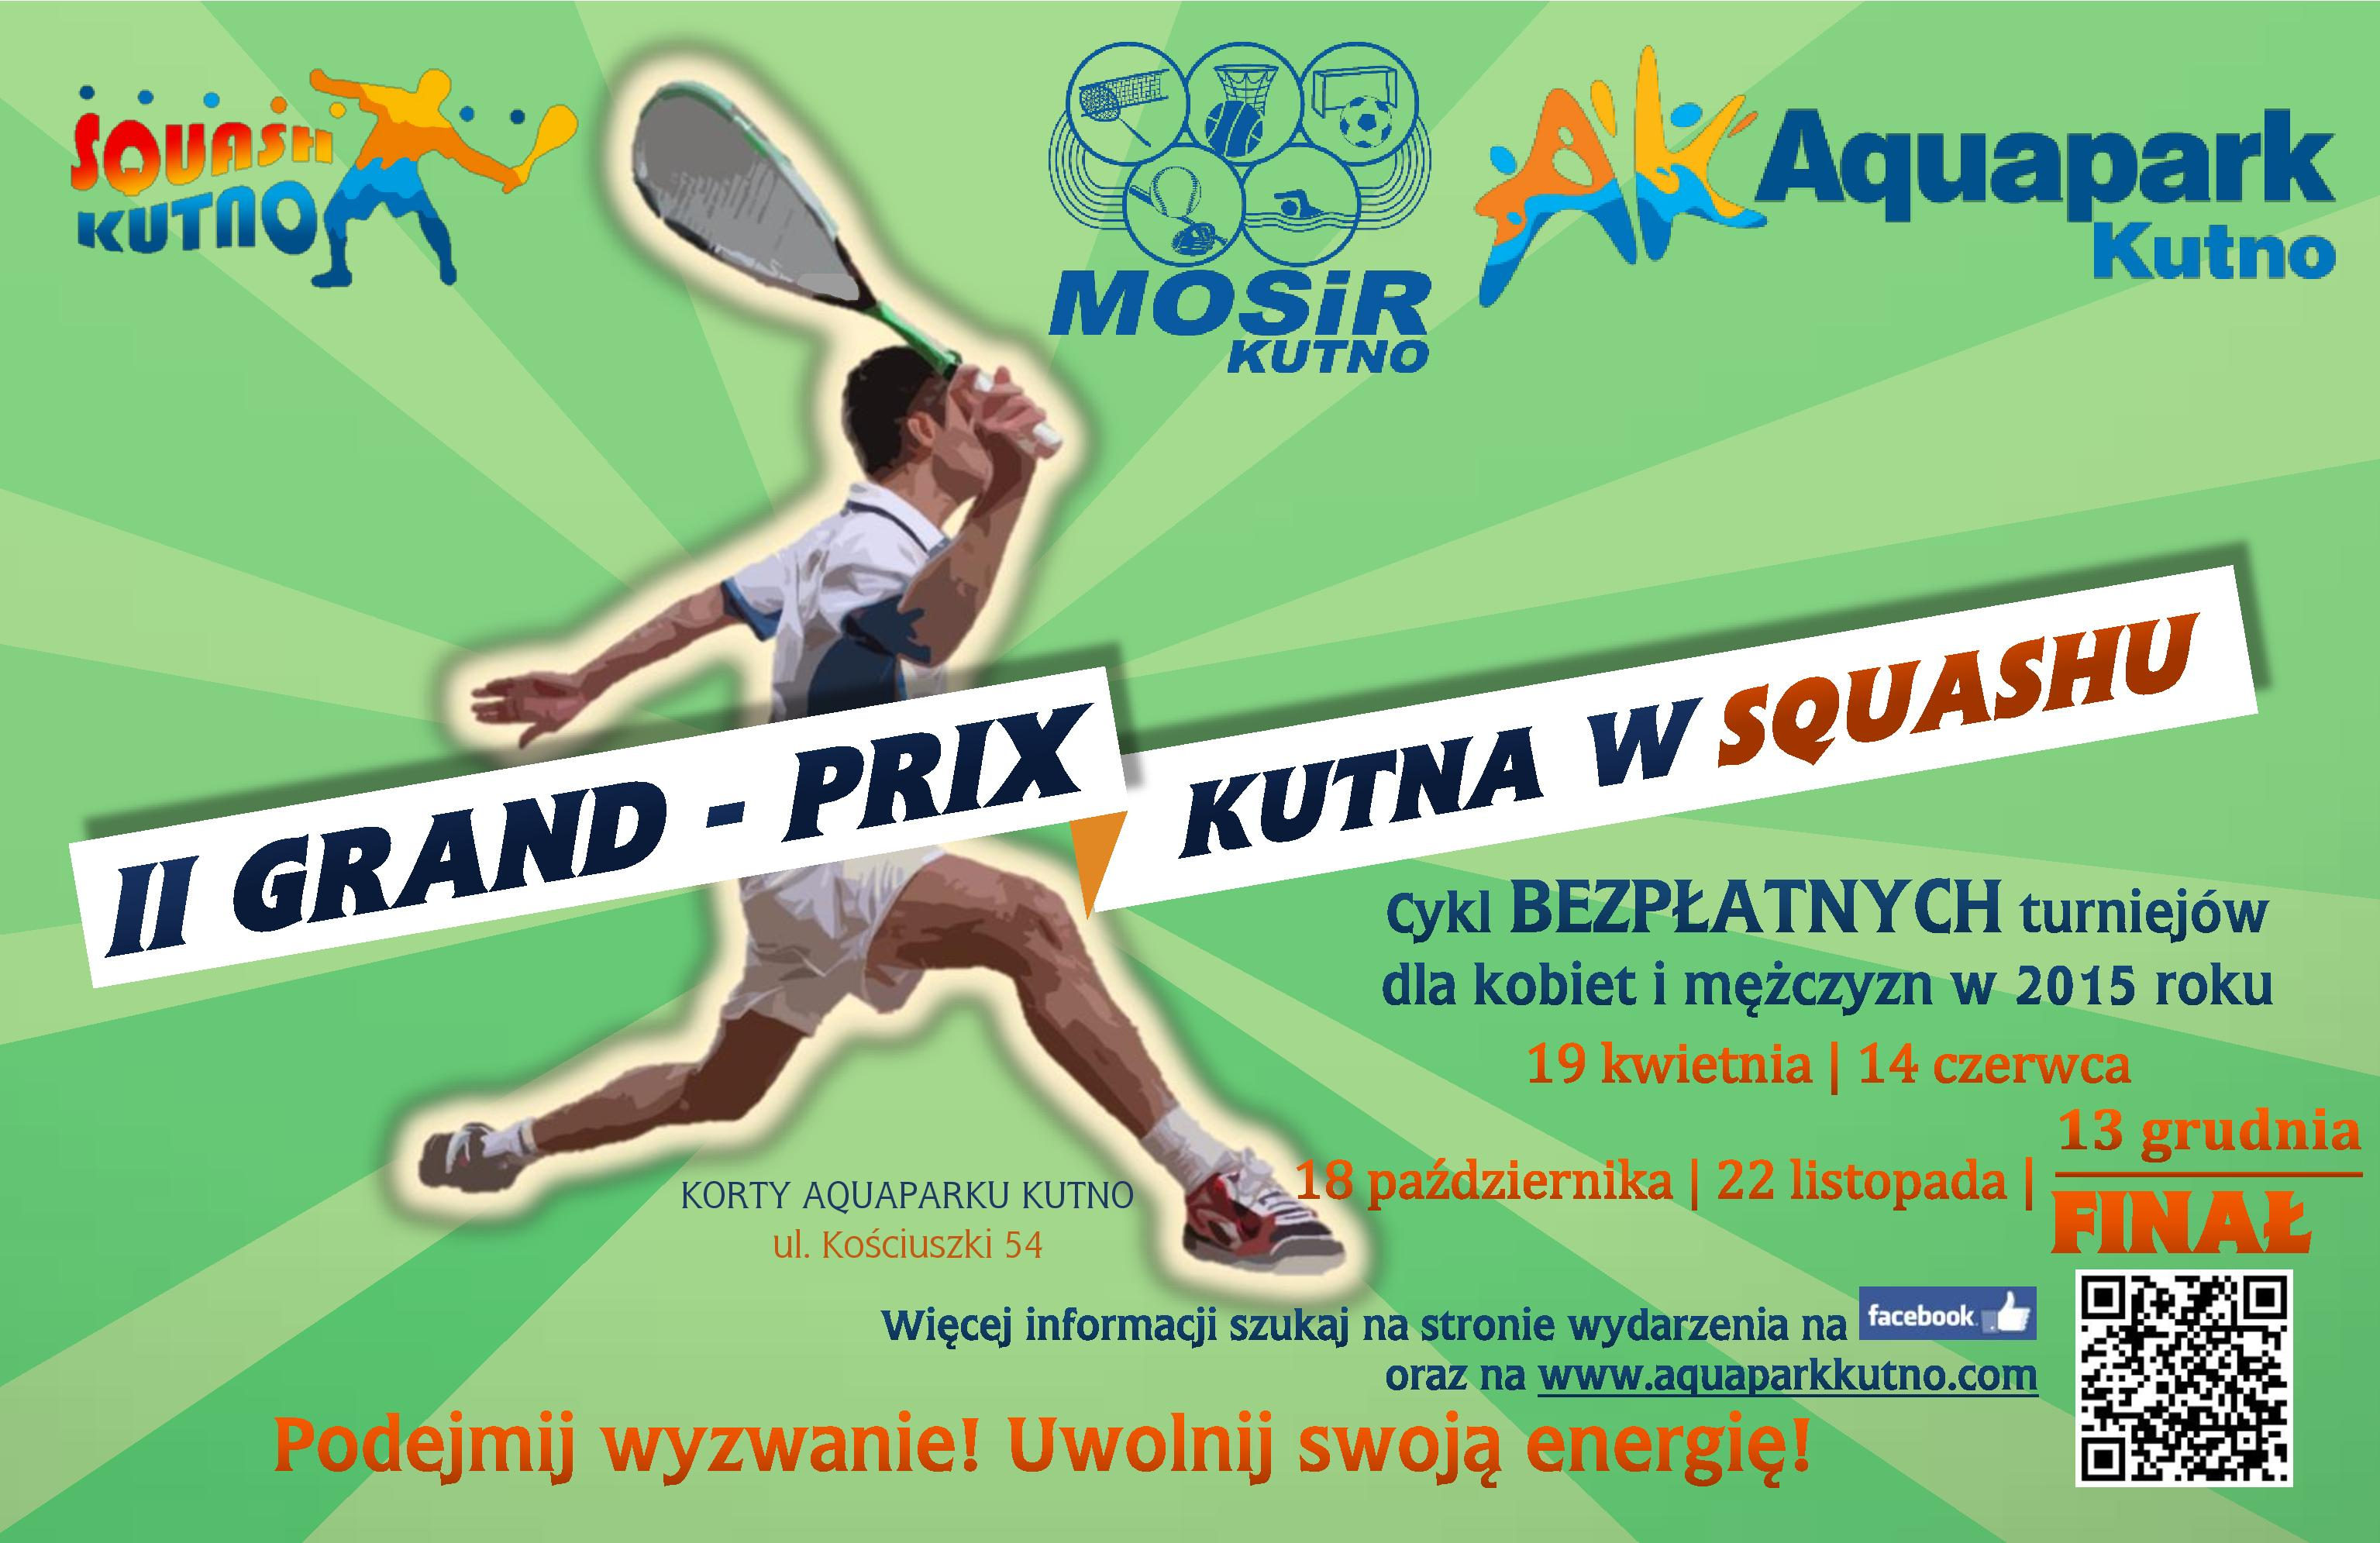 4 turniej squasha rozegrany!